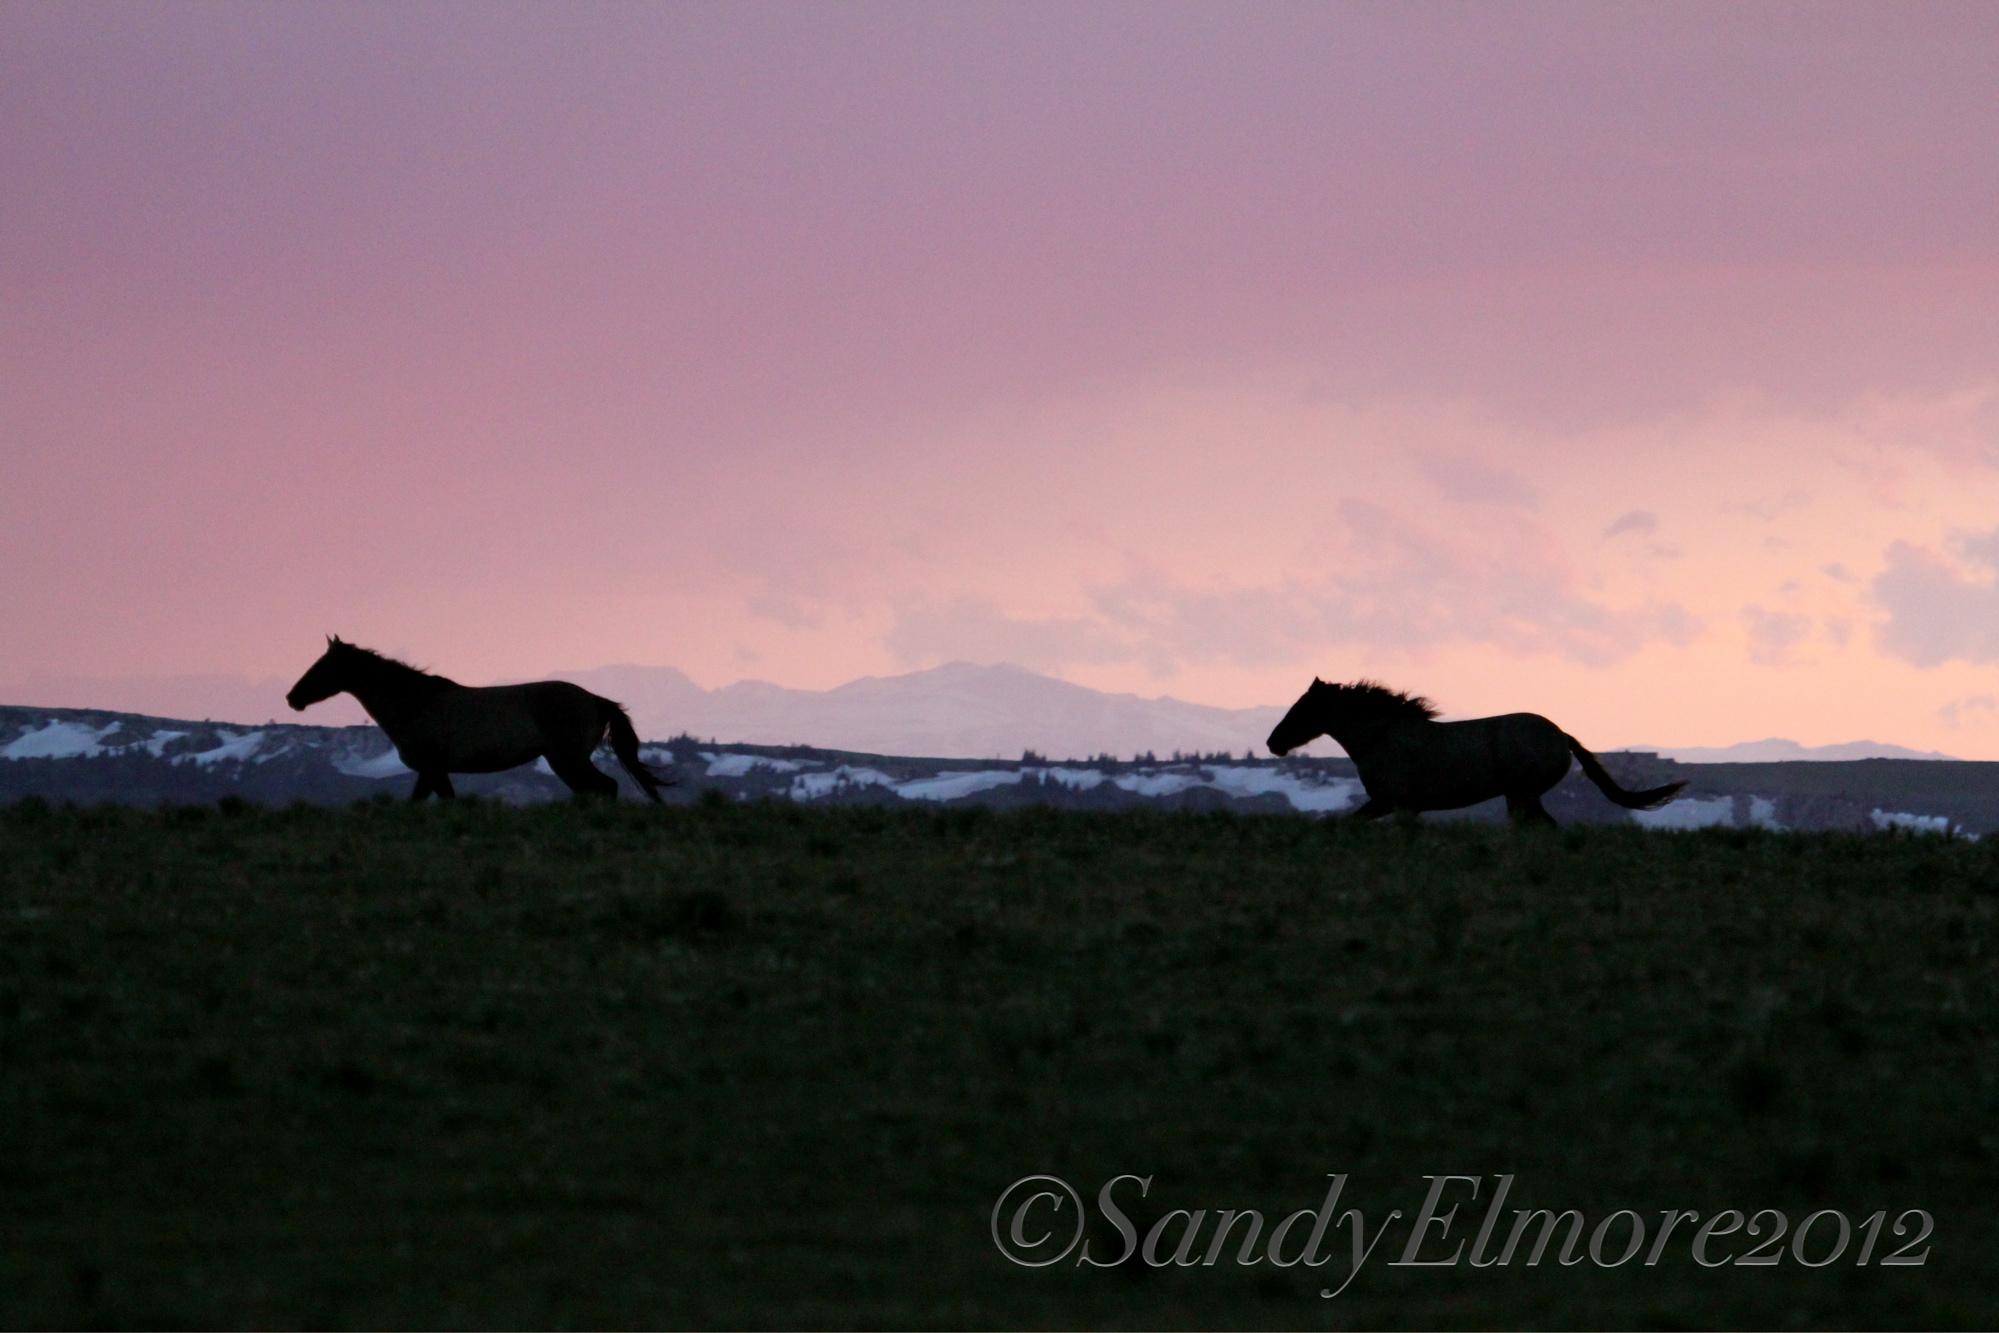 Sunset, June 17, 2012